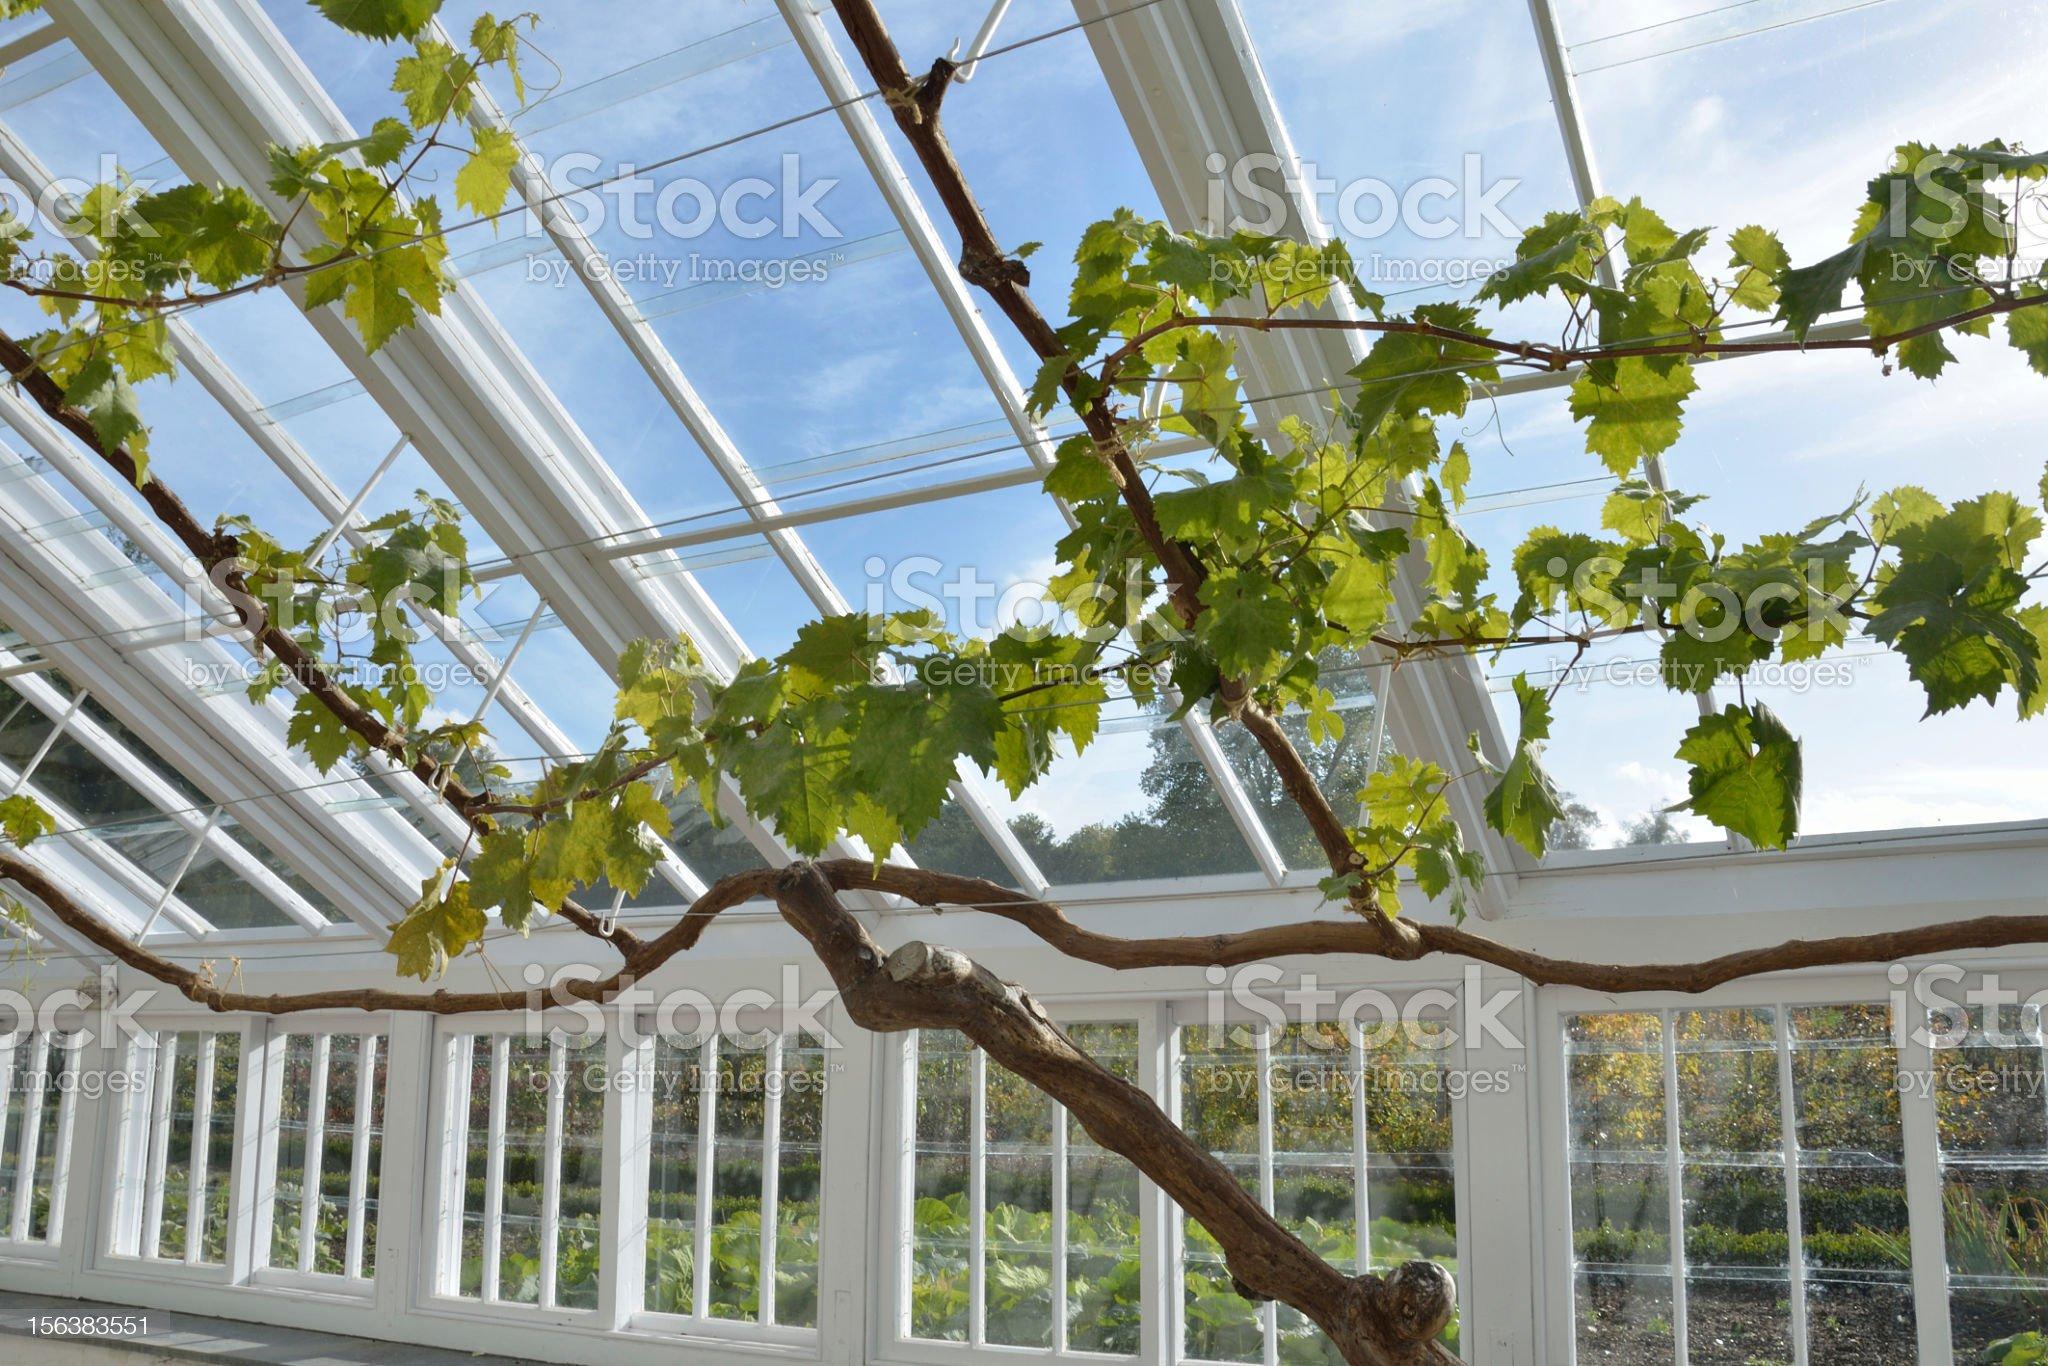 grape vine in greenhouse royalty-free stock photo